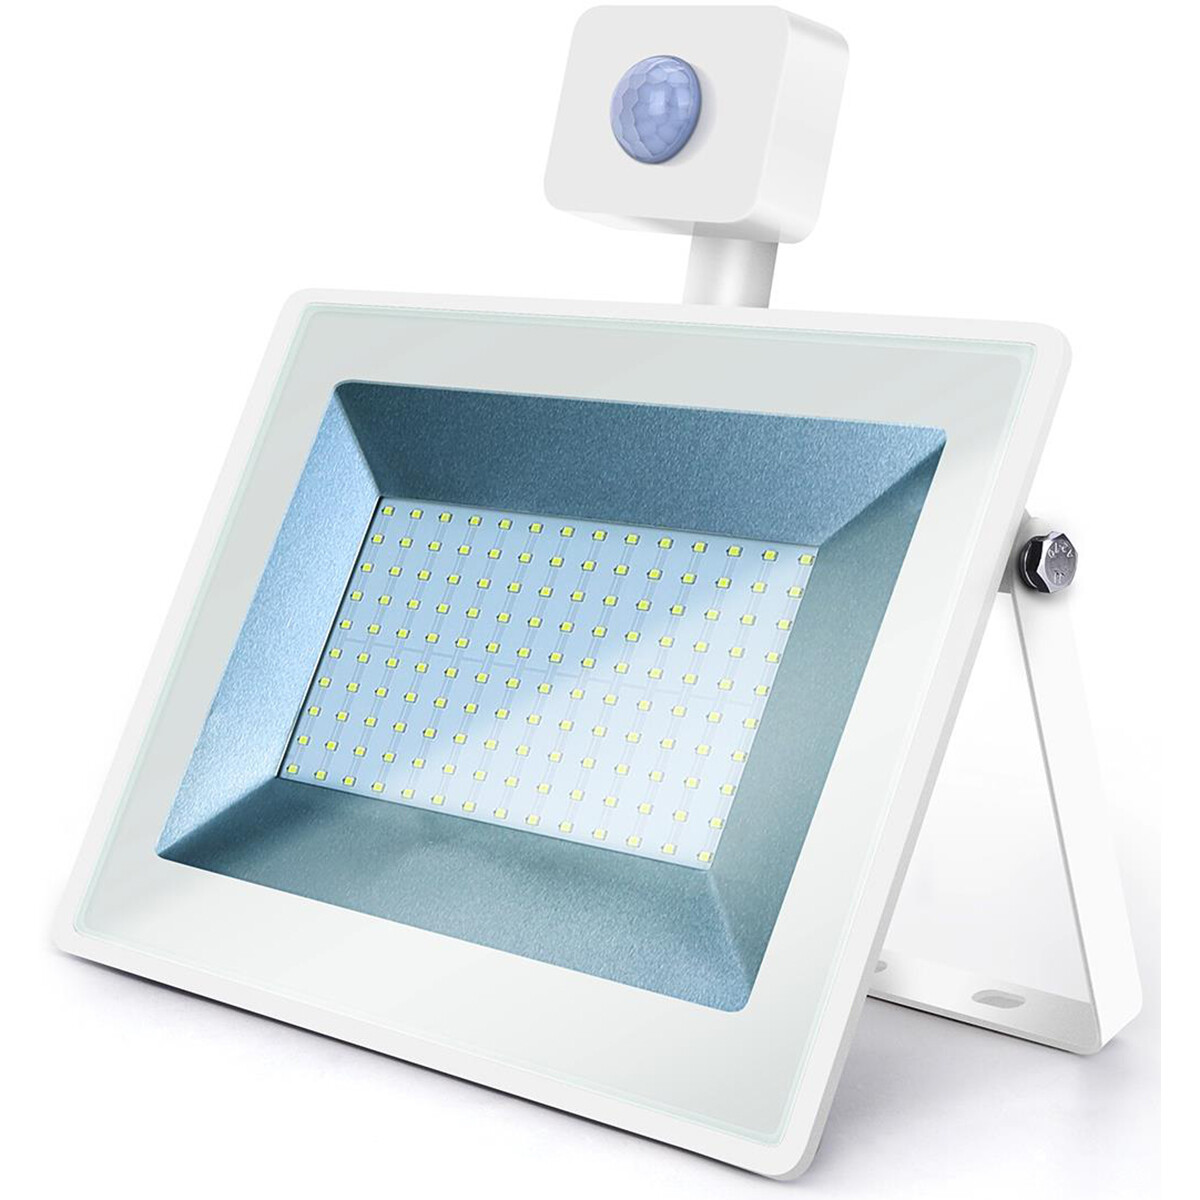 LED Bouwlamp 100 Watt met Sensor - LED Schijnwerper - Aigi Sunny - Helder/Koud Wit 6400K - Waterdich